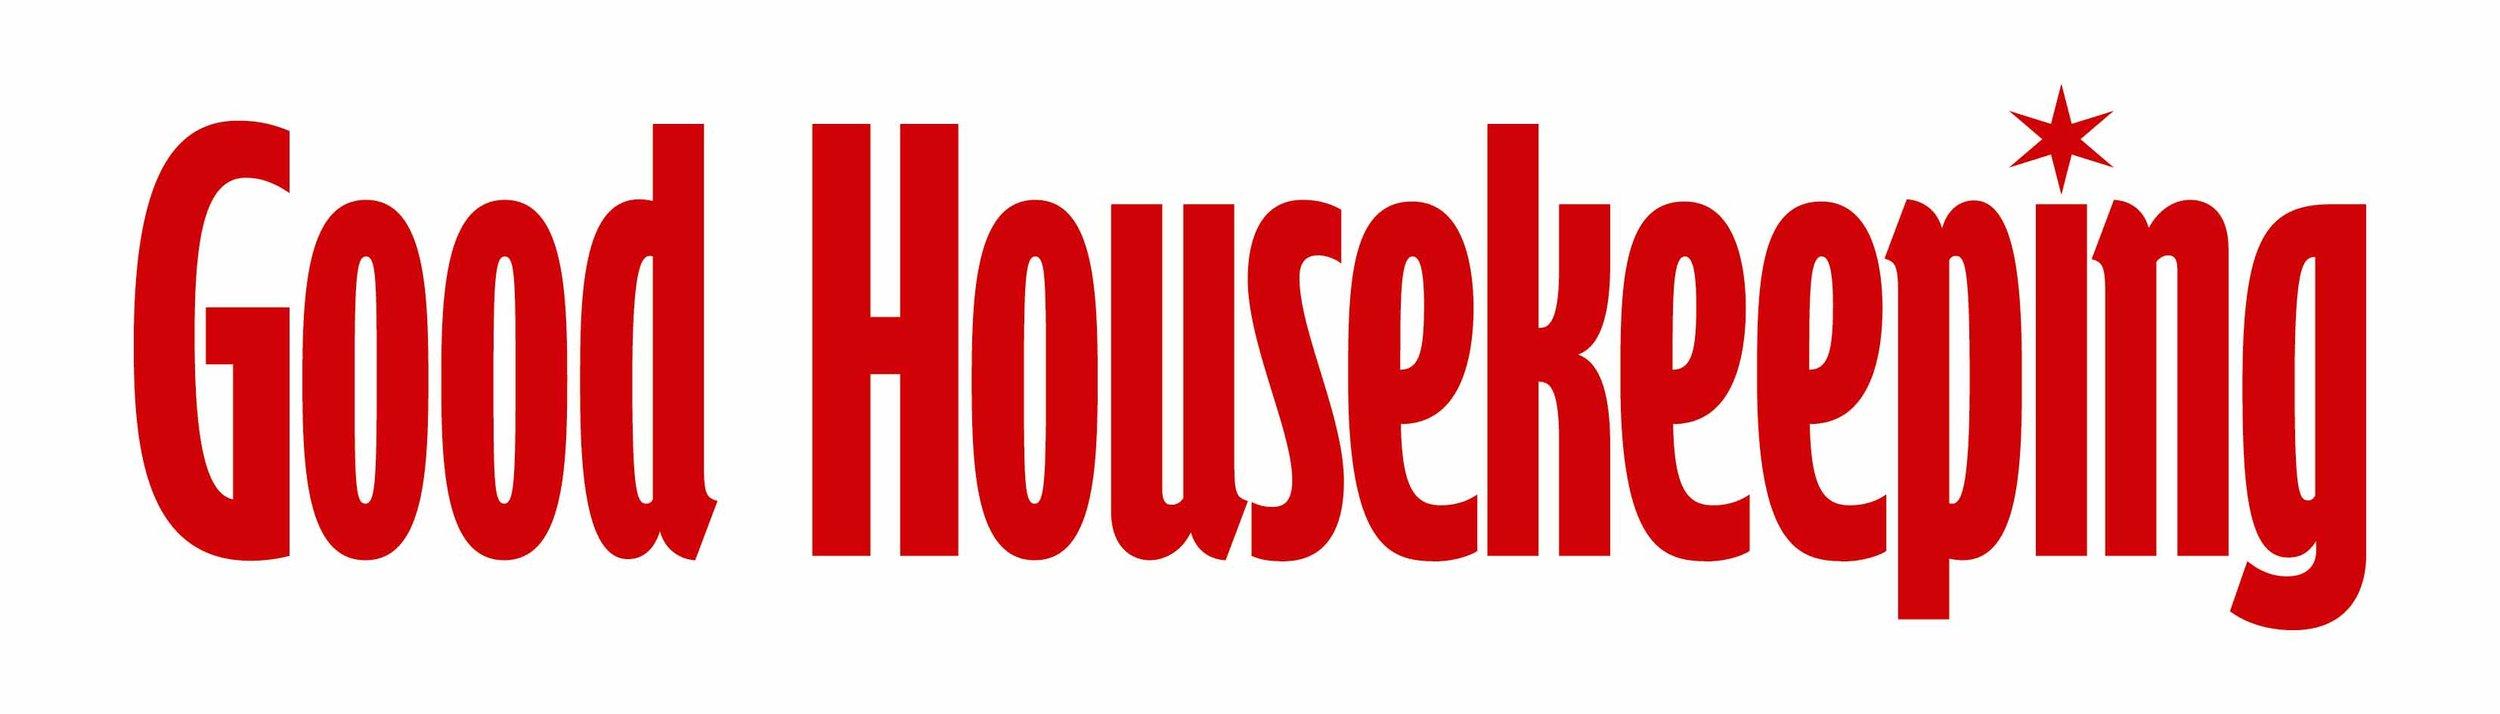 GH_logo.jpg